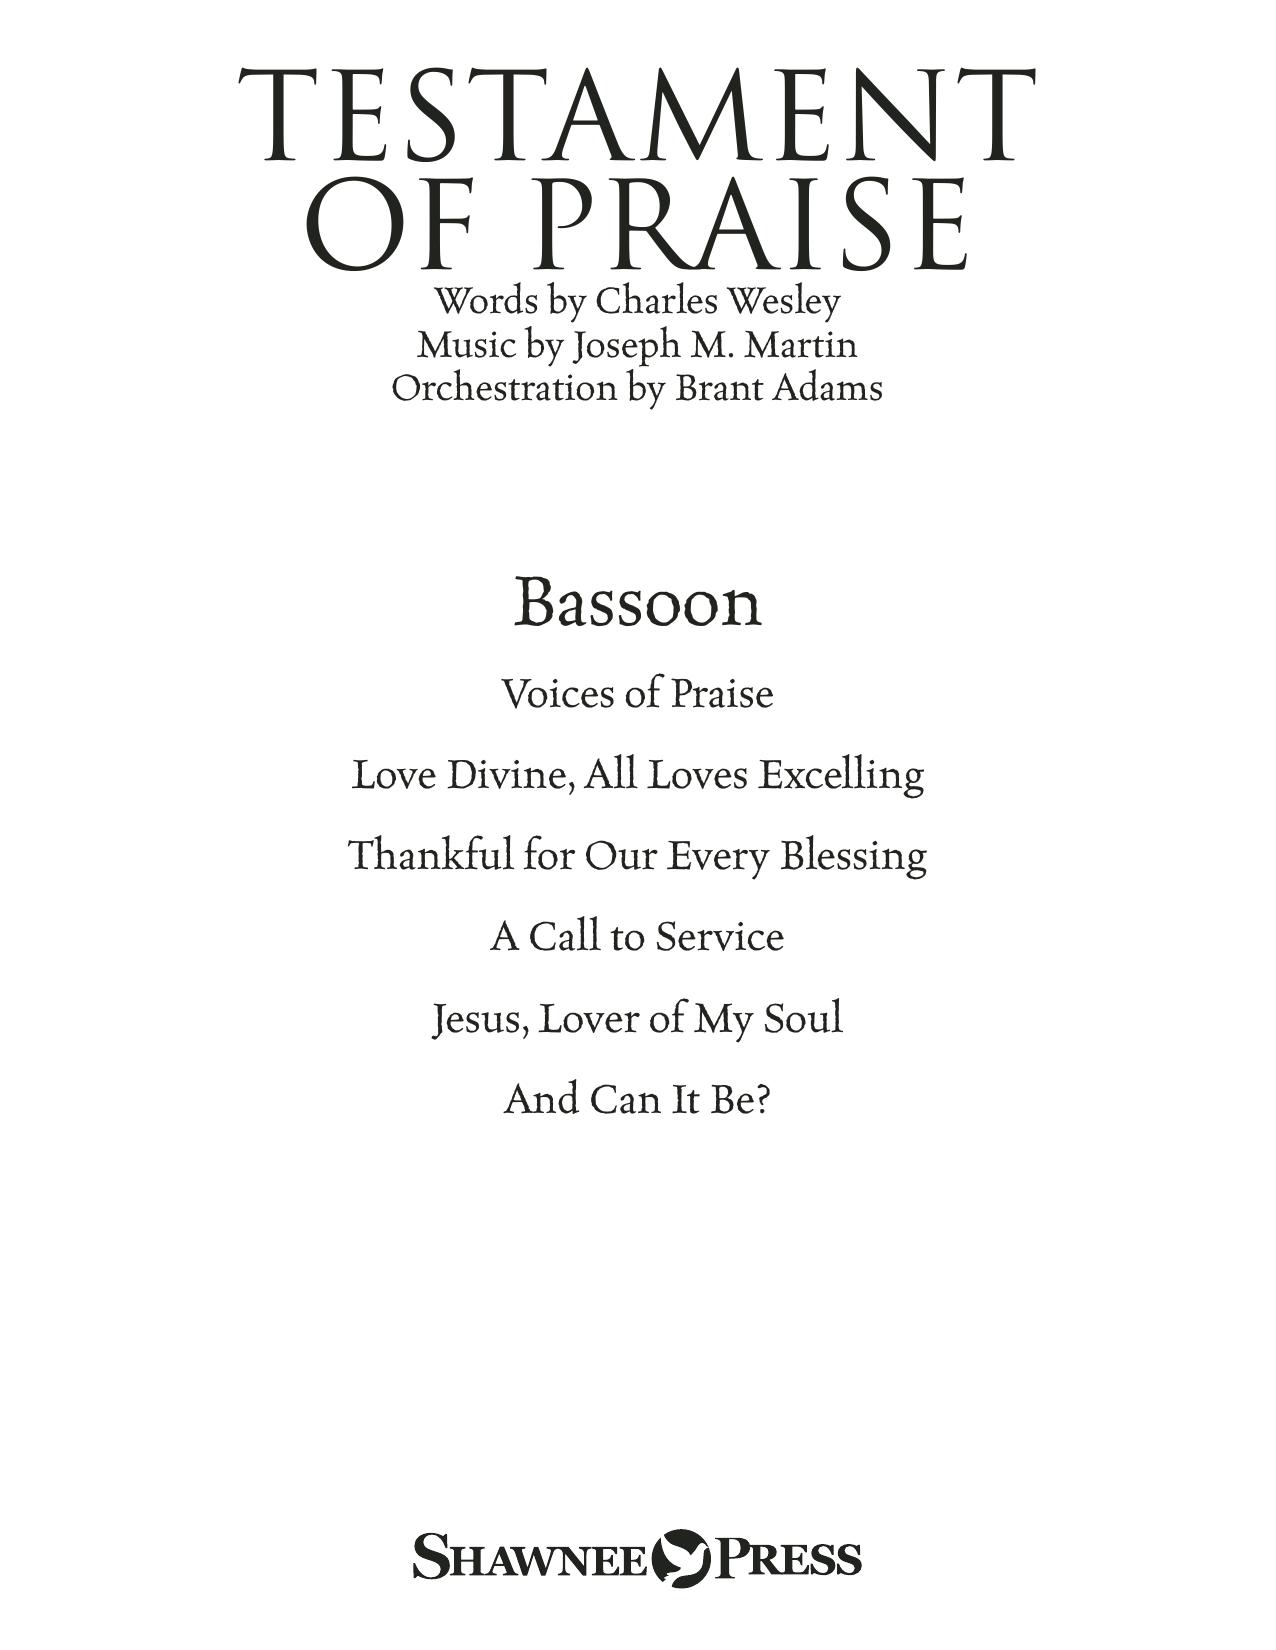 Testament of Praise (A Celebration of Faith) - Bassoon Sheet Music